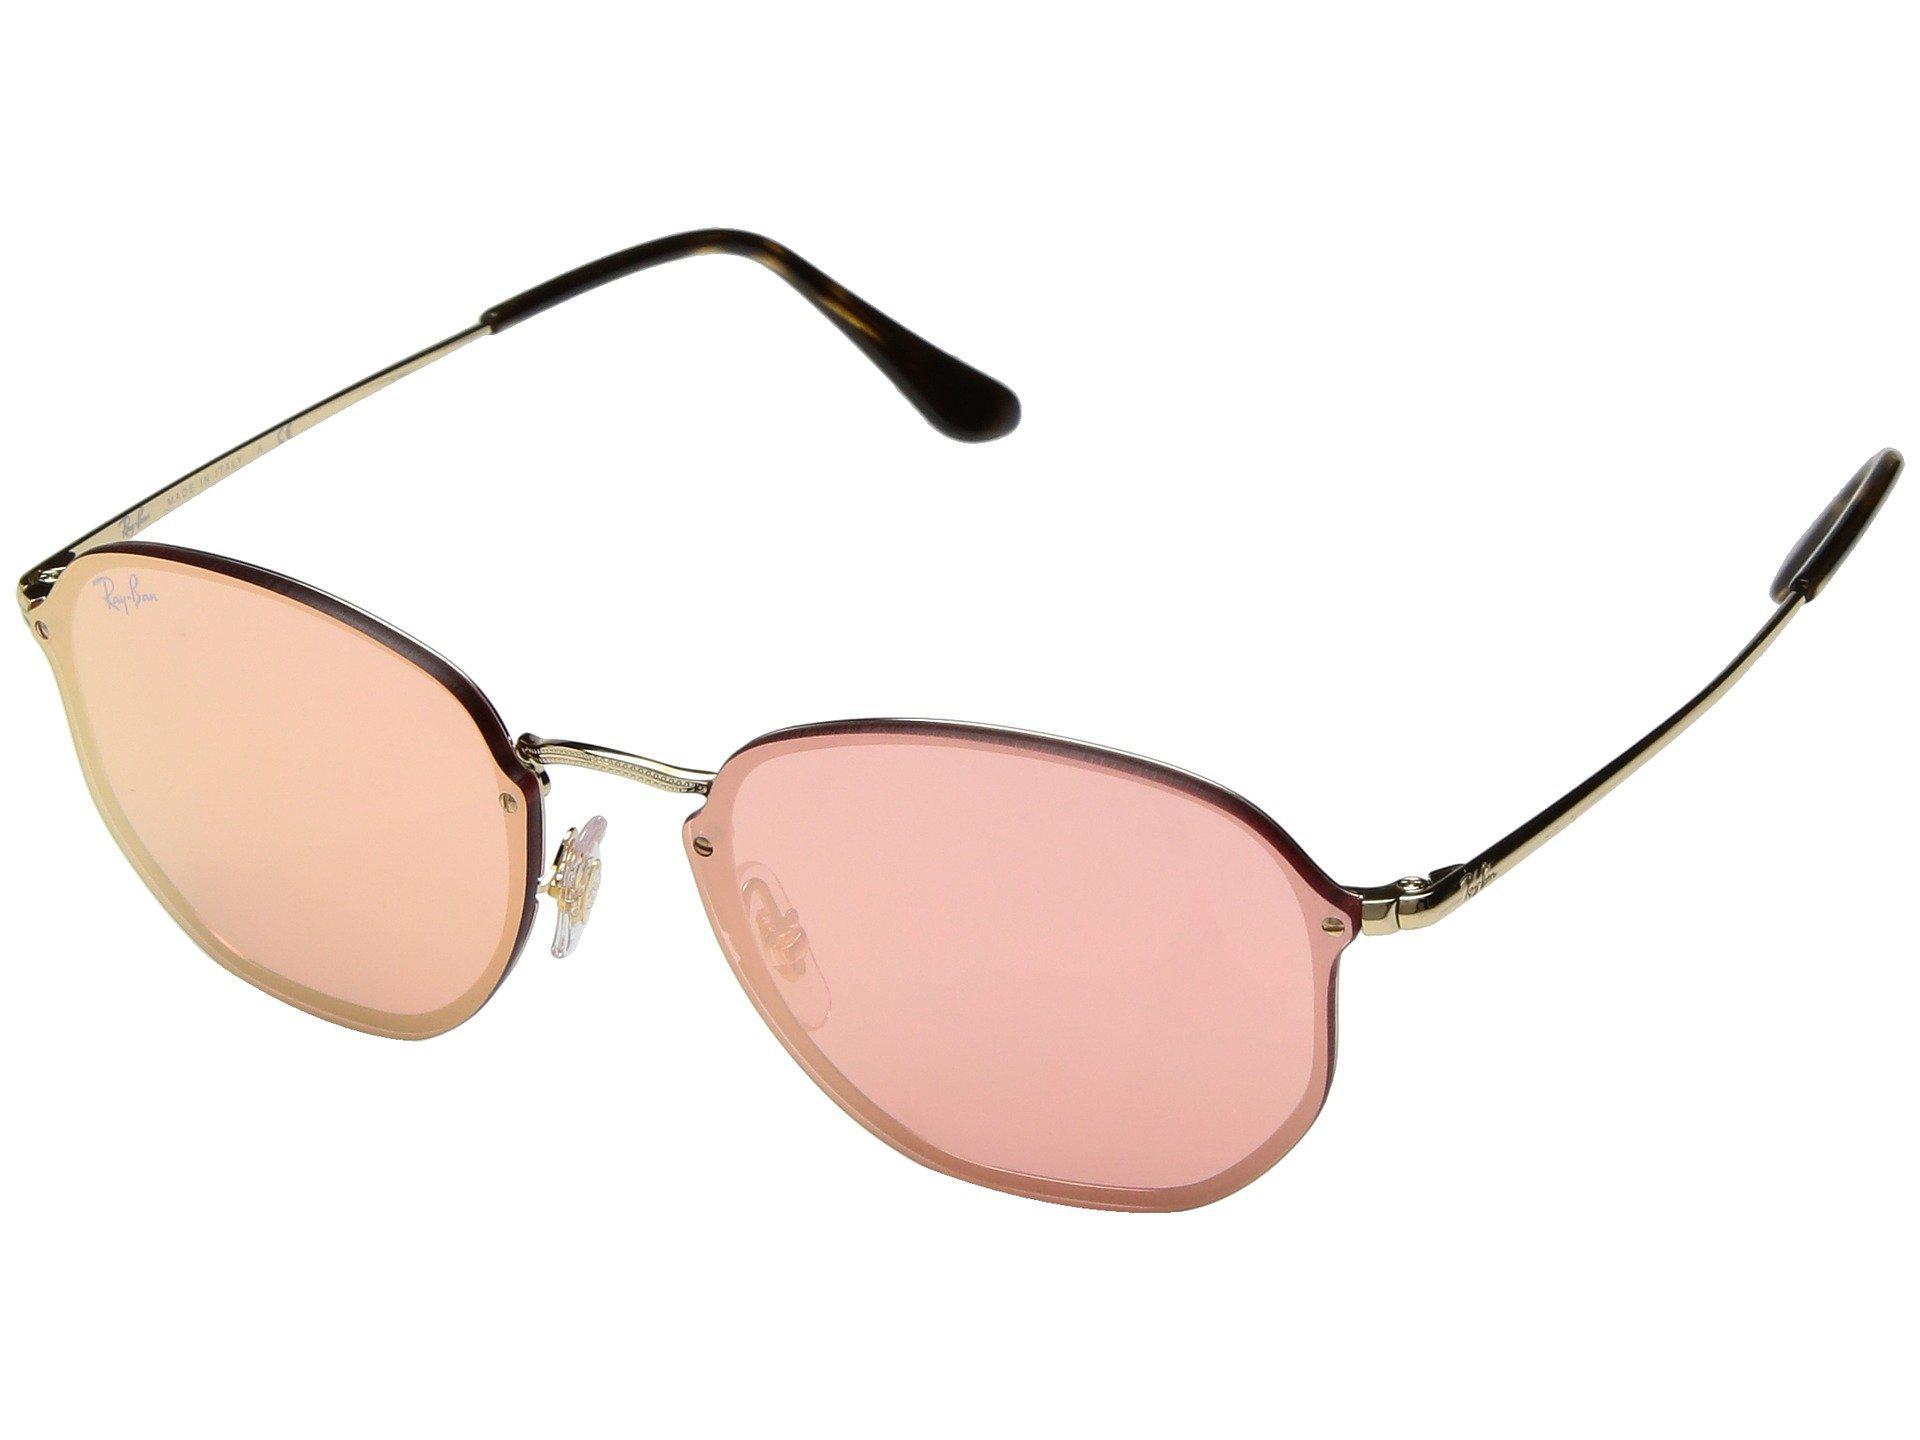 507bab9e67 Ray-Ban. Women s Blaze Hexagonal Rb3579n 58mm (gold pink Mirror) Fashion  Sunglasses